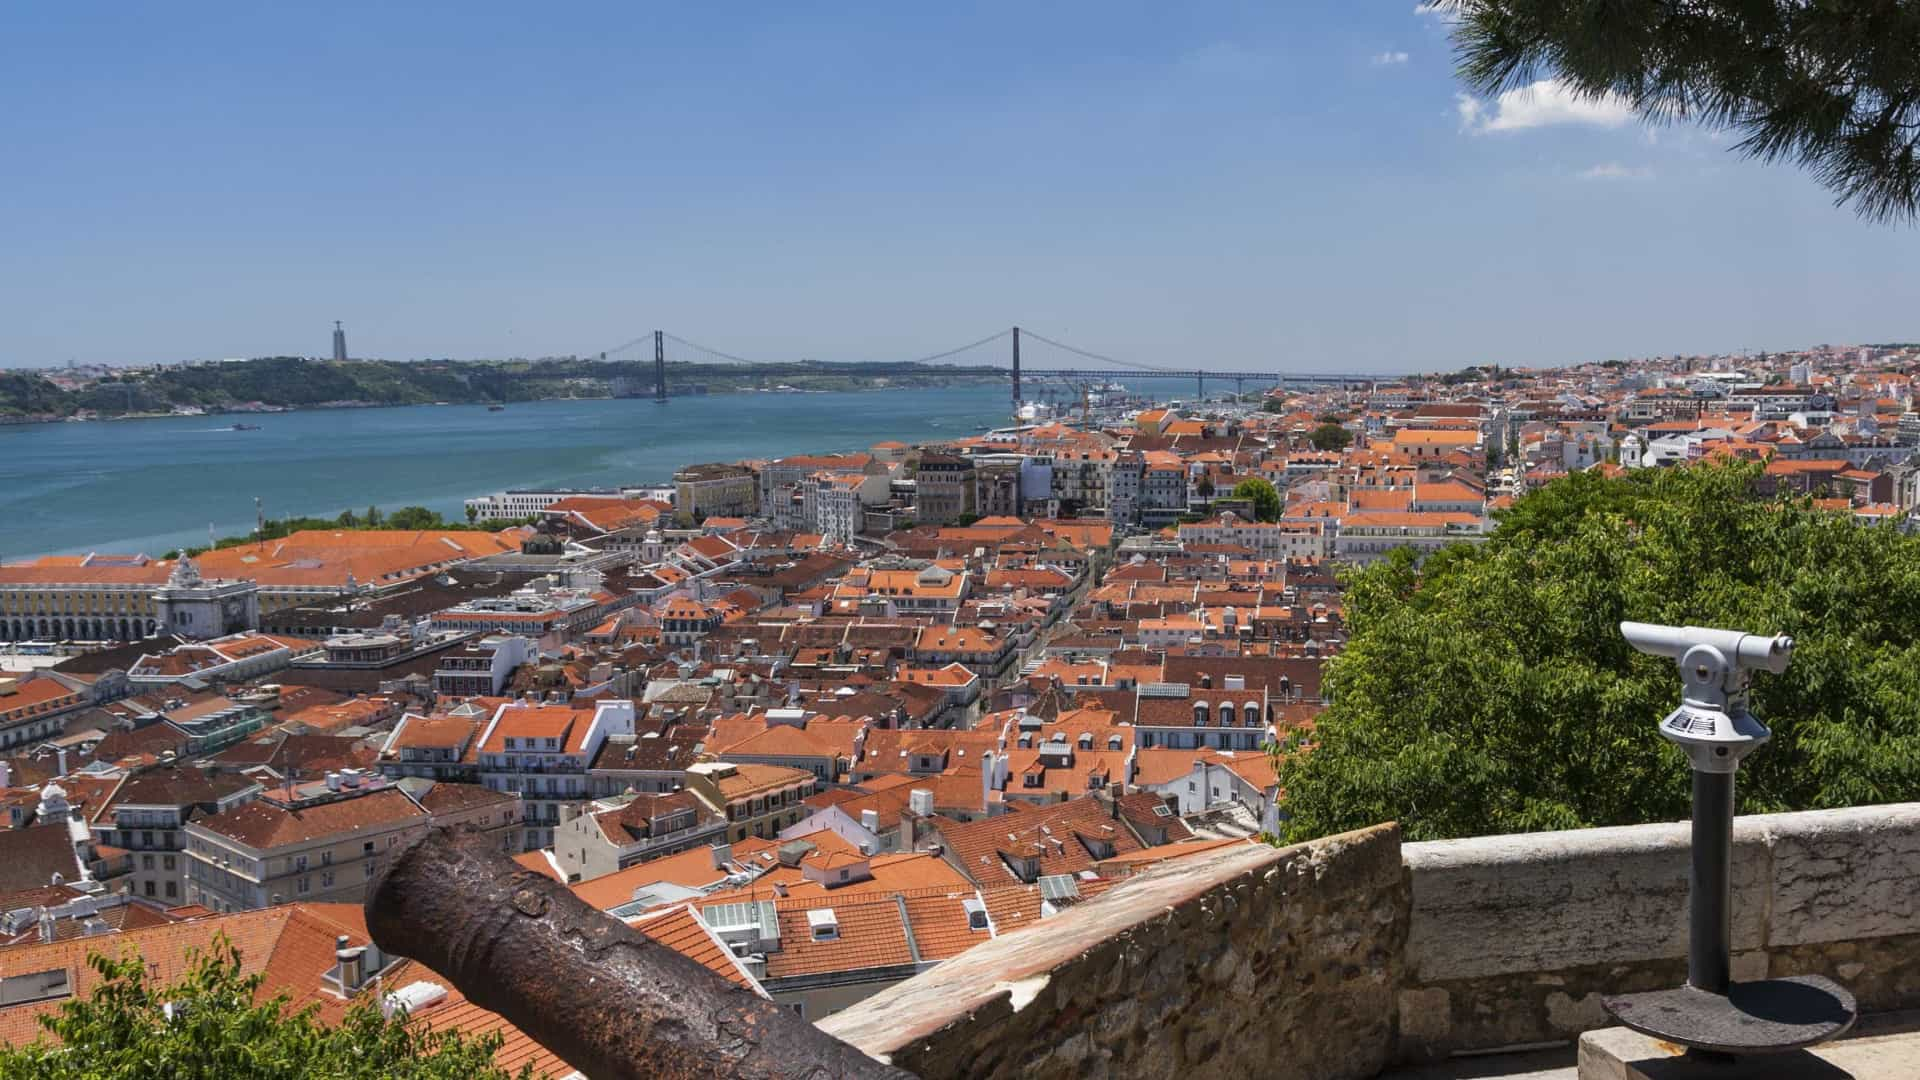 Lisboa desce no ranking das cidades mais caras do mundo